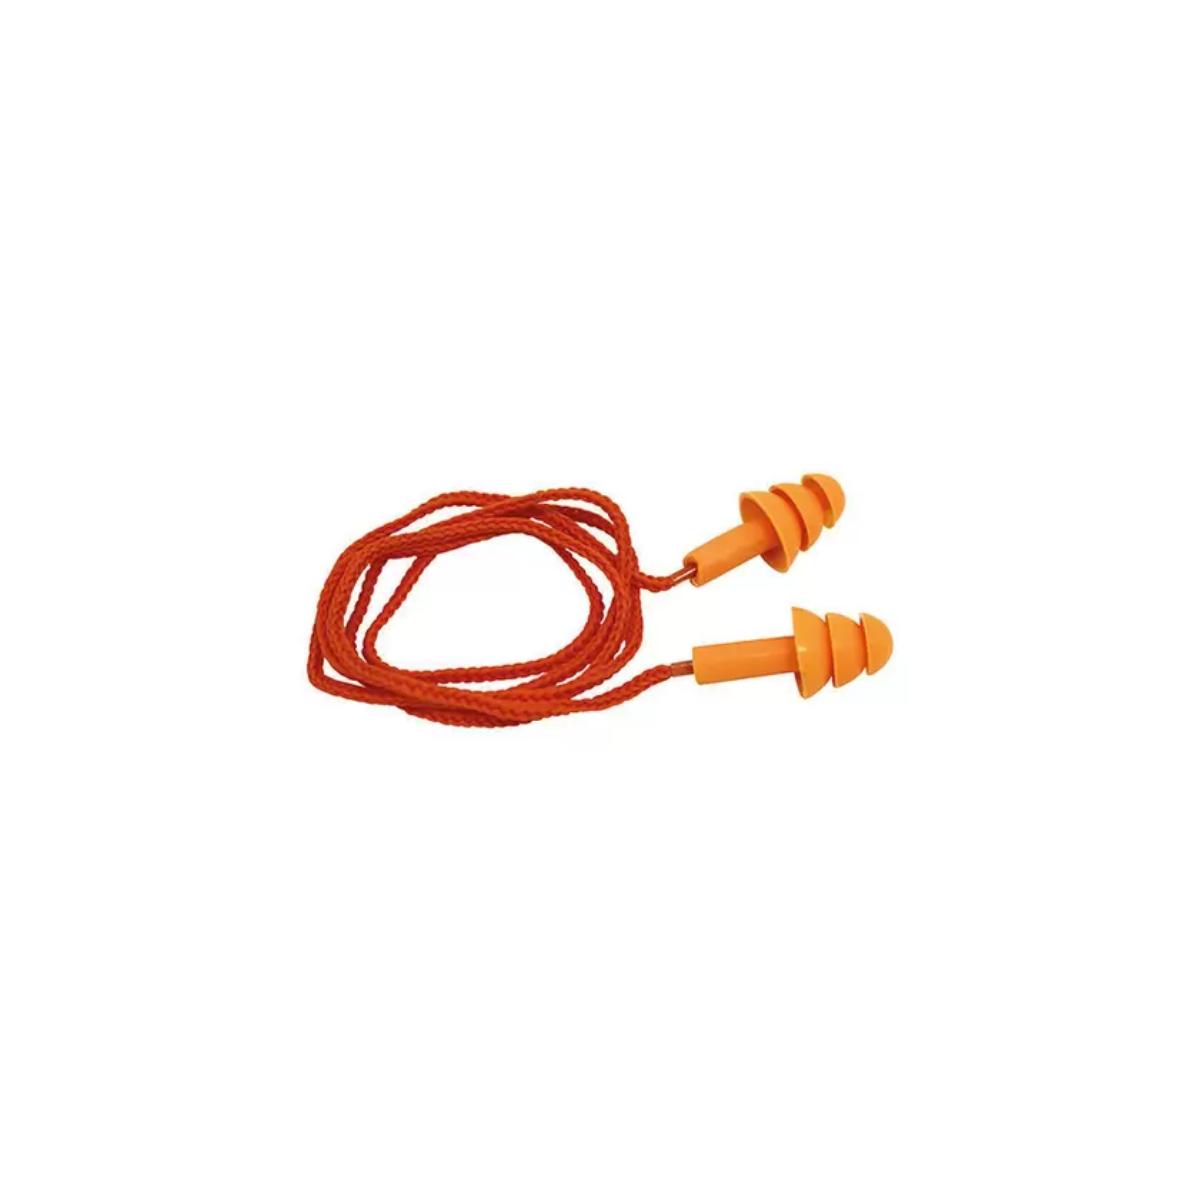 Kit 10 Protetores Auditivos Auriculares K-10 Plug Silicone Laranja